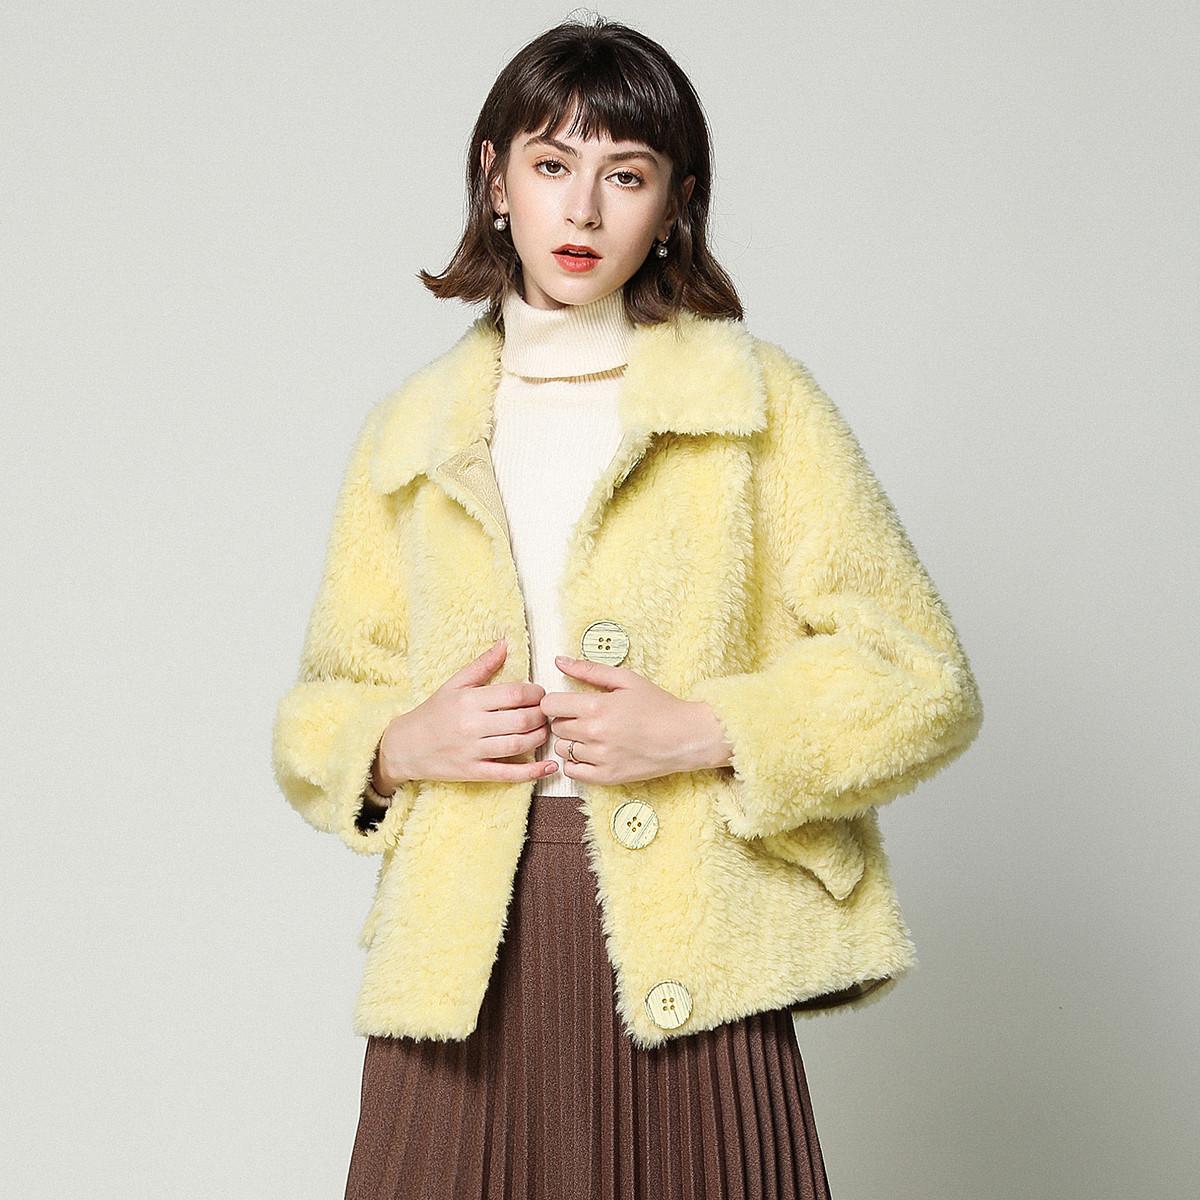 Blue Port100%羊毛复合一体羊剪绒皮草外套秋冬新款单排扣短款羊毛大衣女QL131708